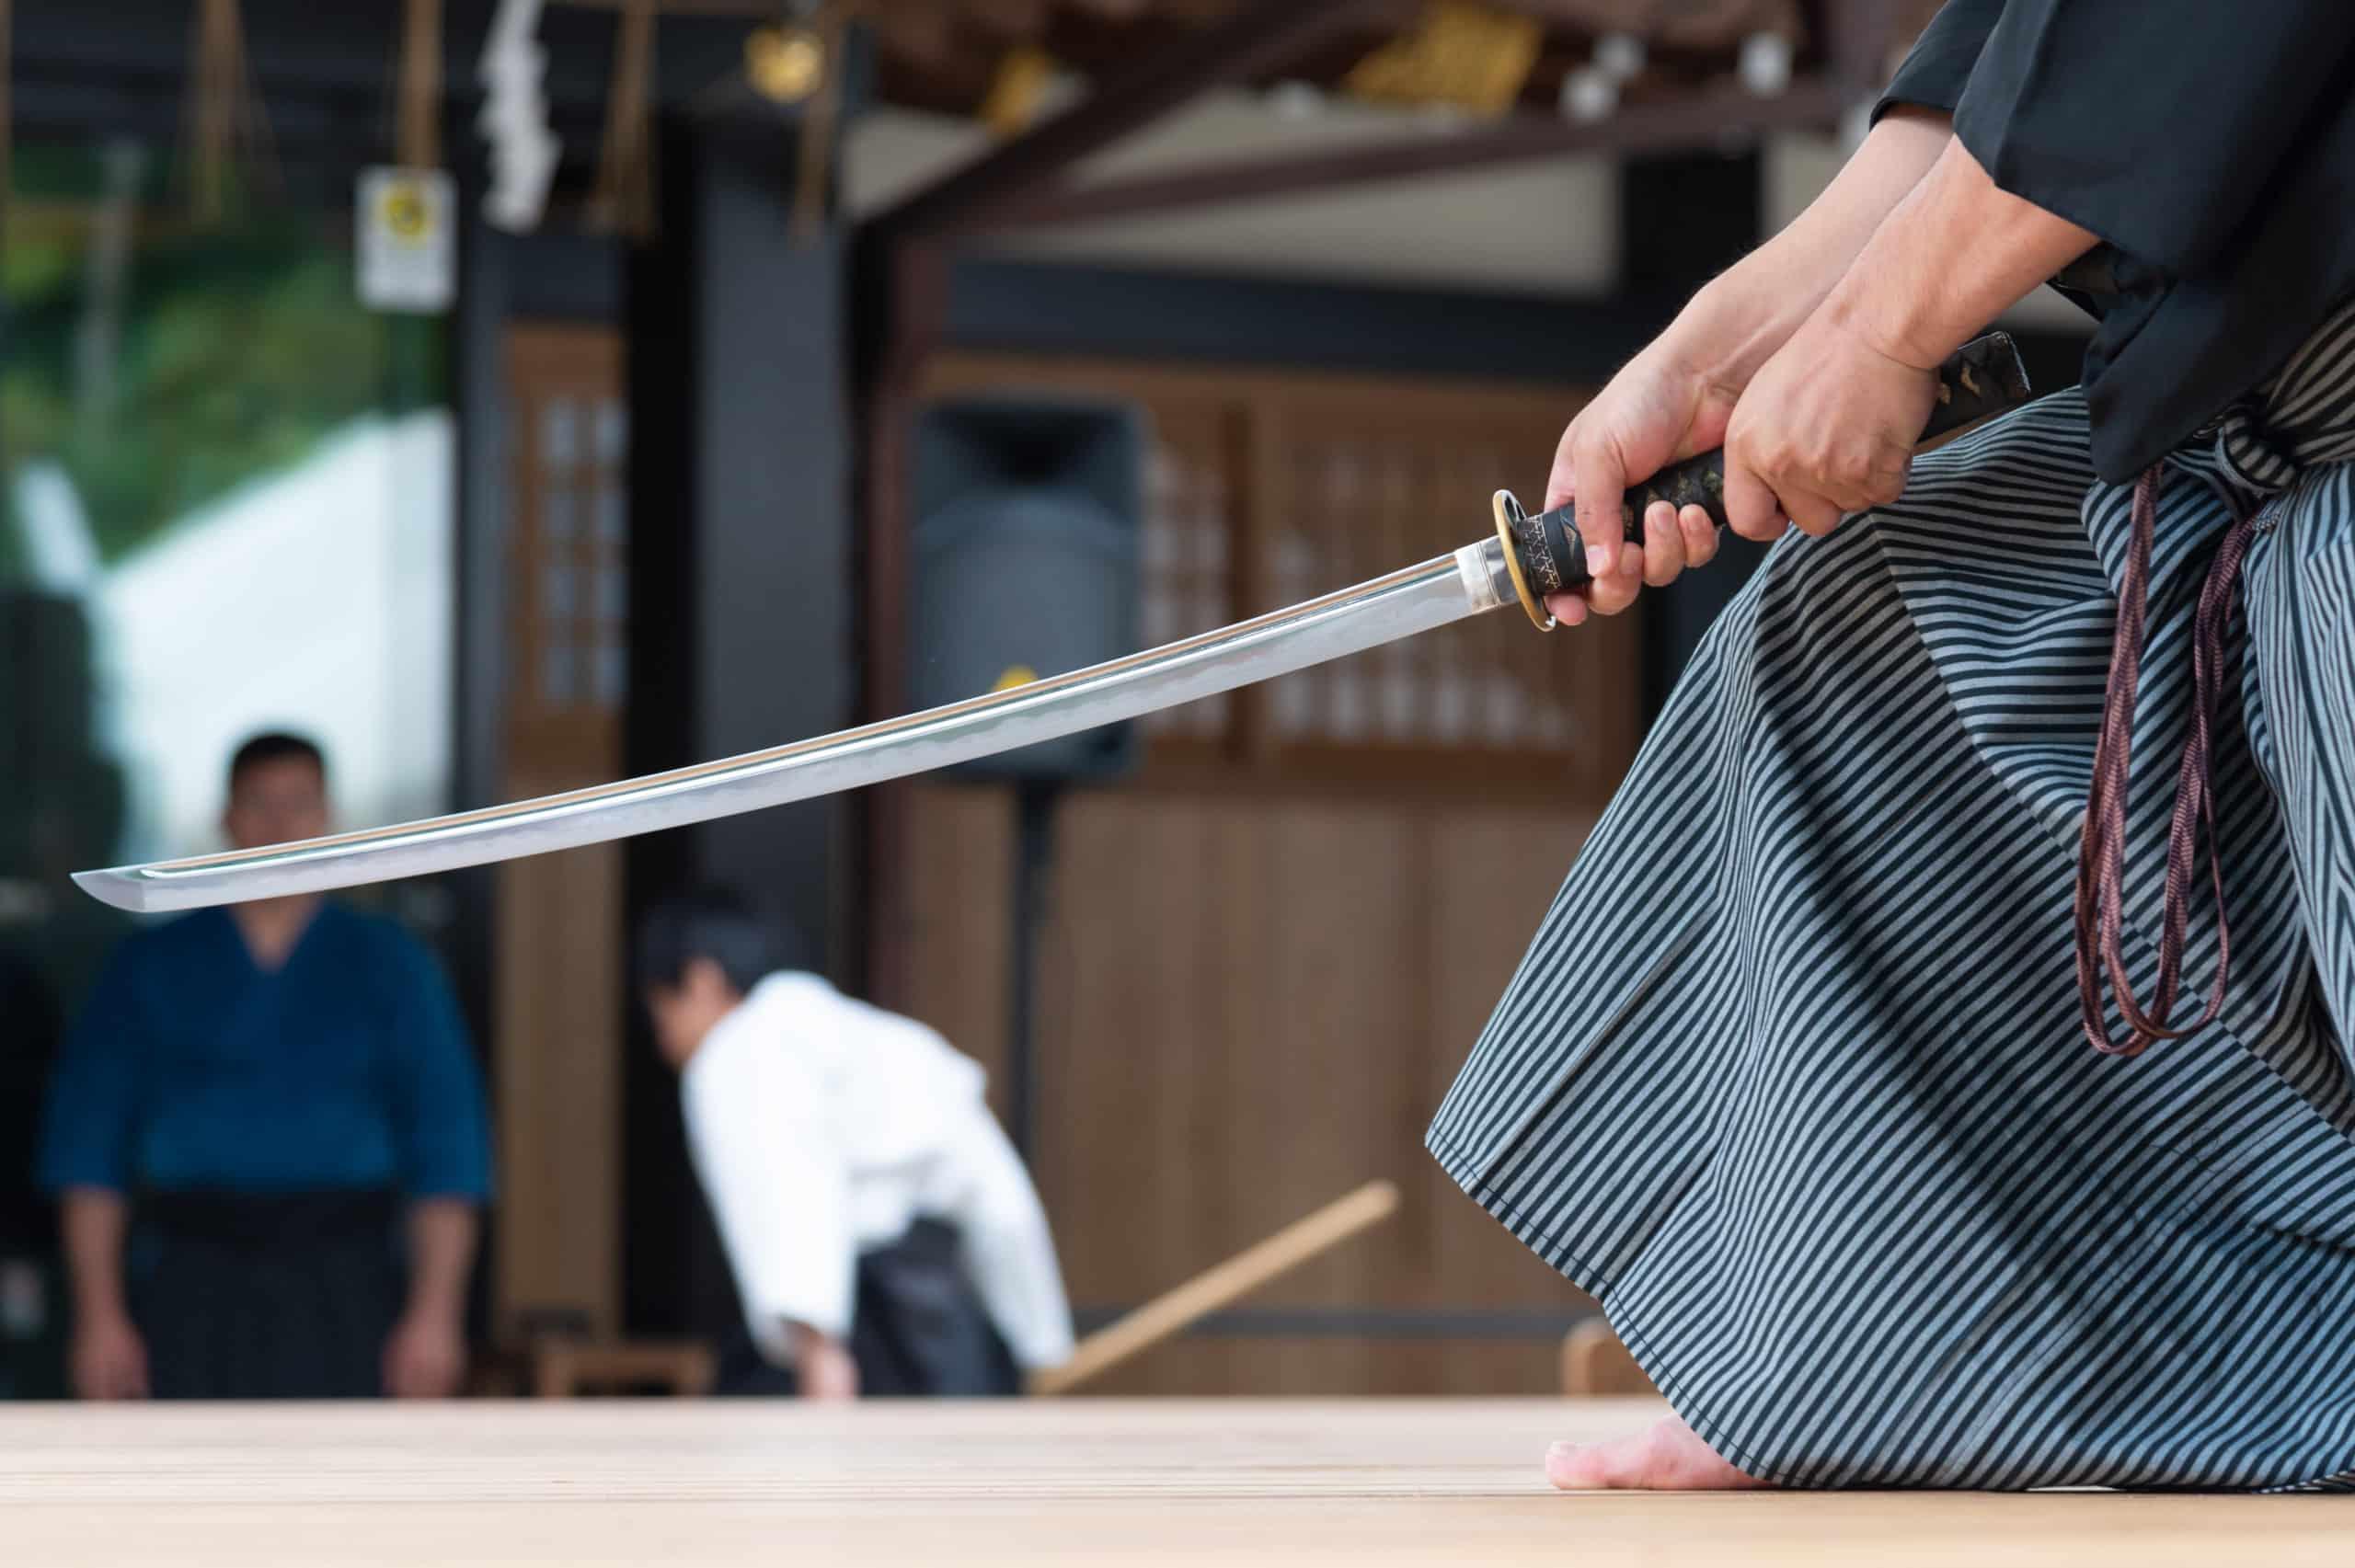 Samurai practicing with sword